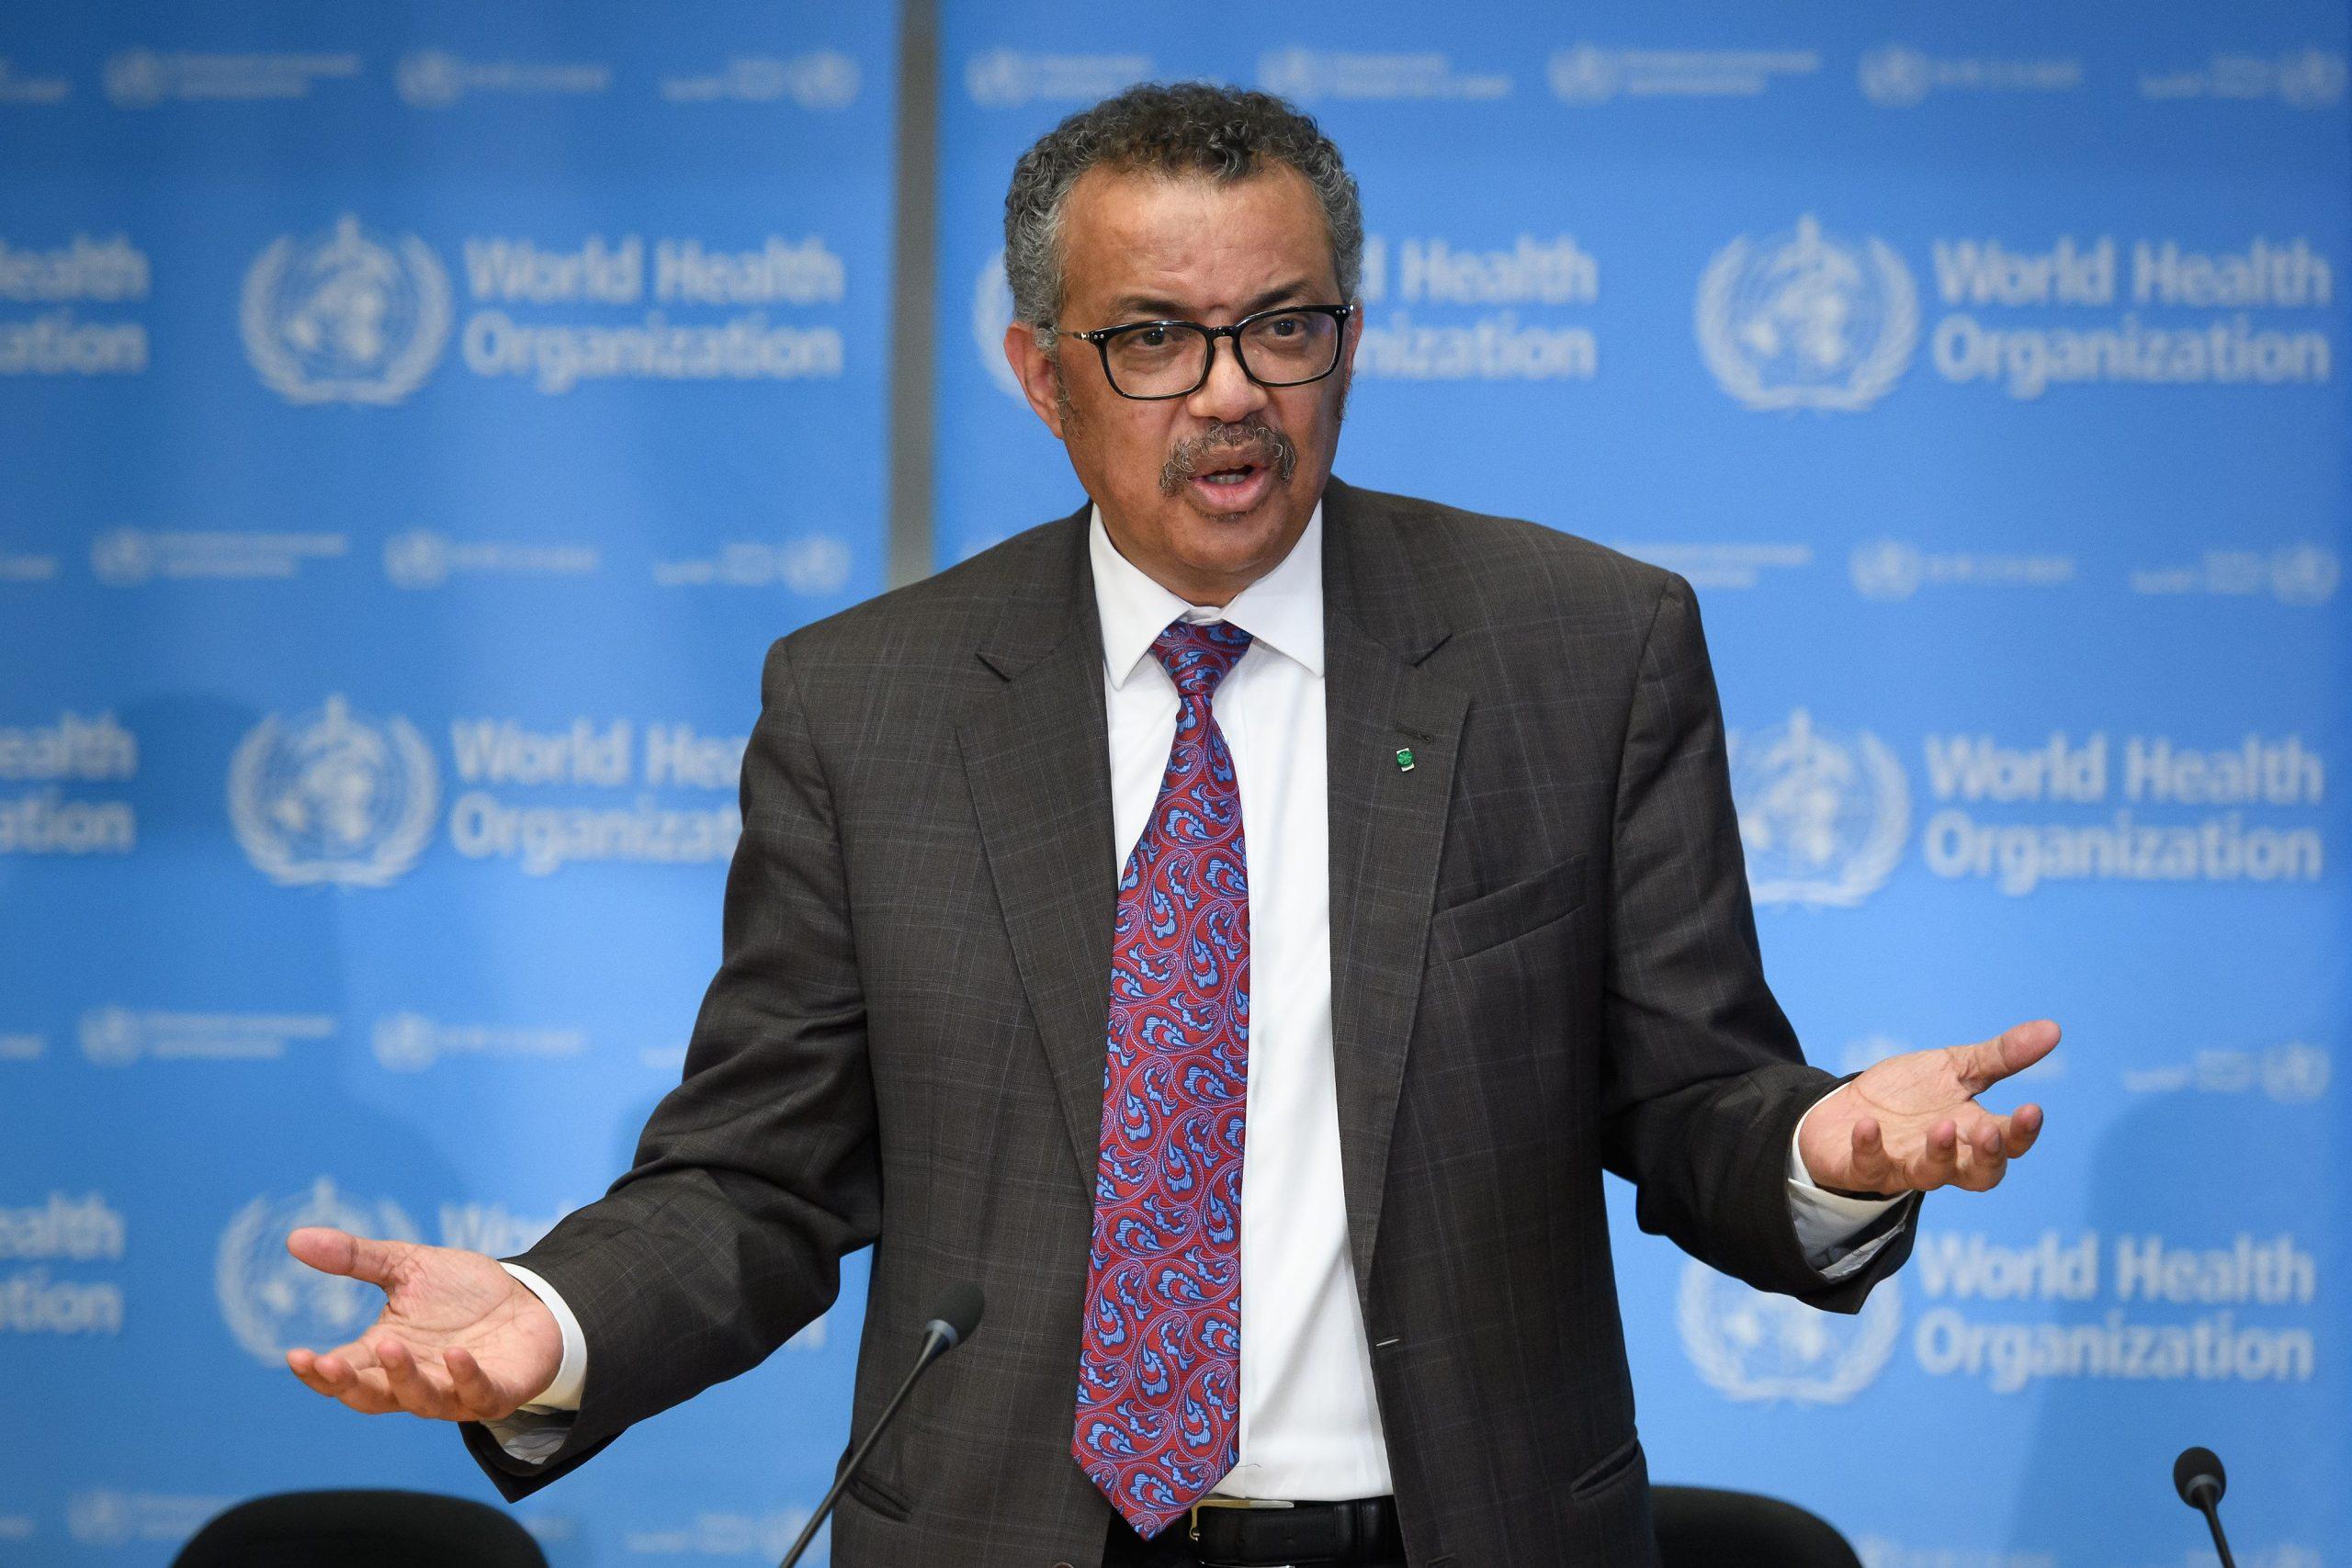 WHO, others announce establishment of global Ebola vaccine stockpile